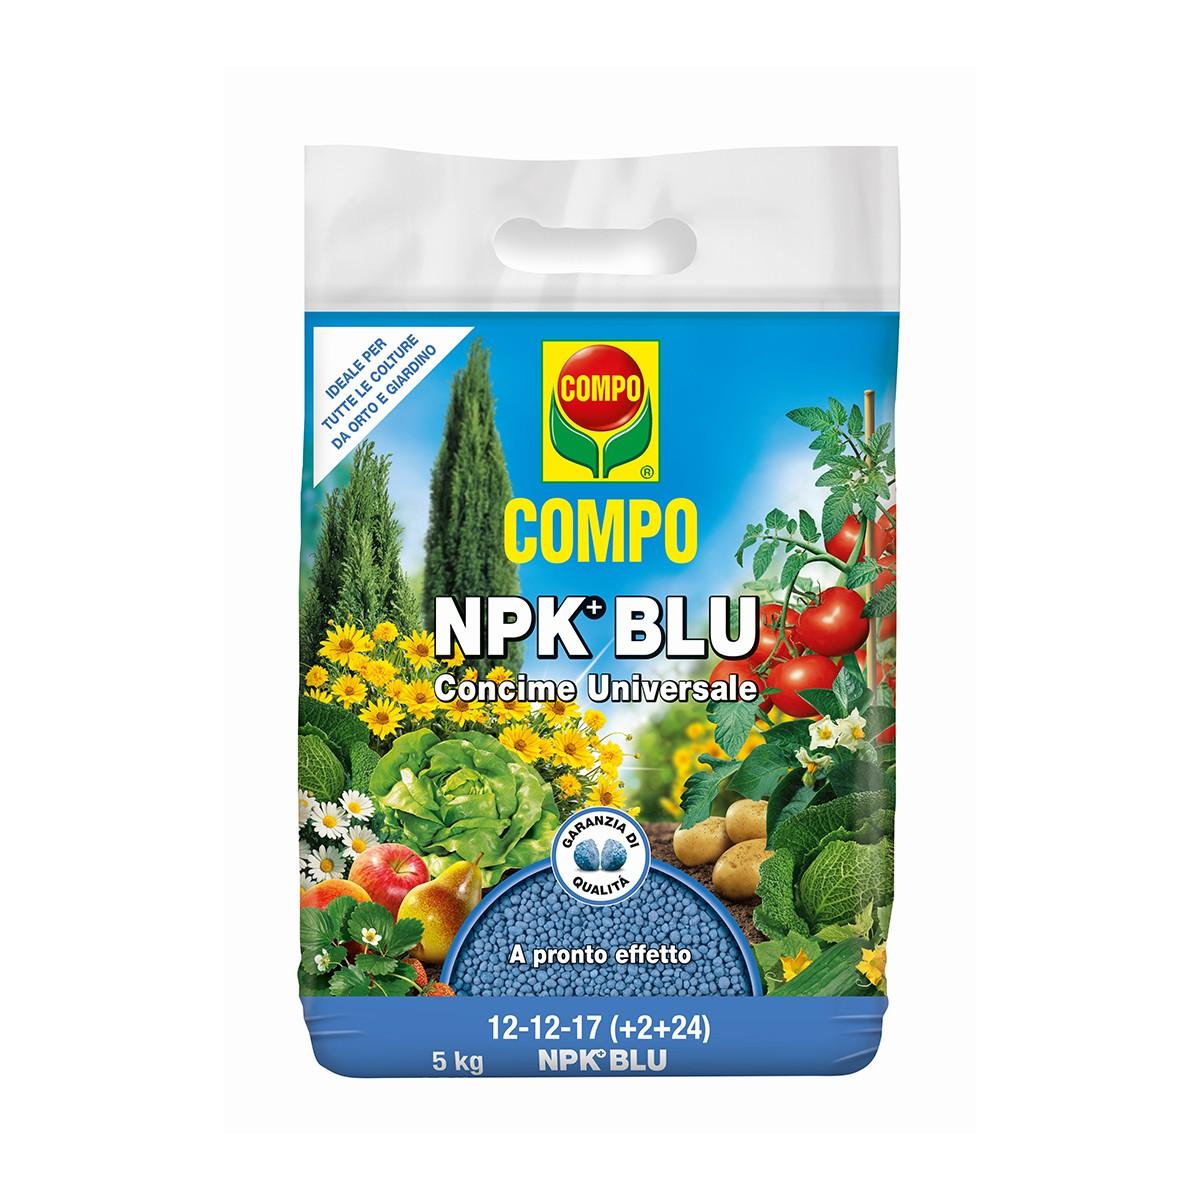 Concime Npk+ Blu